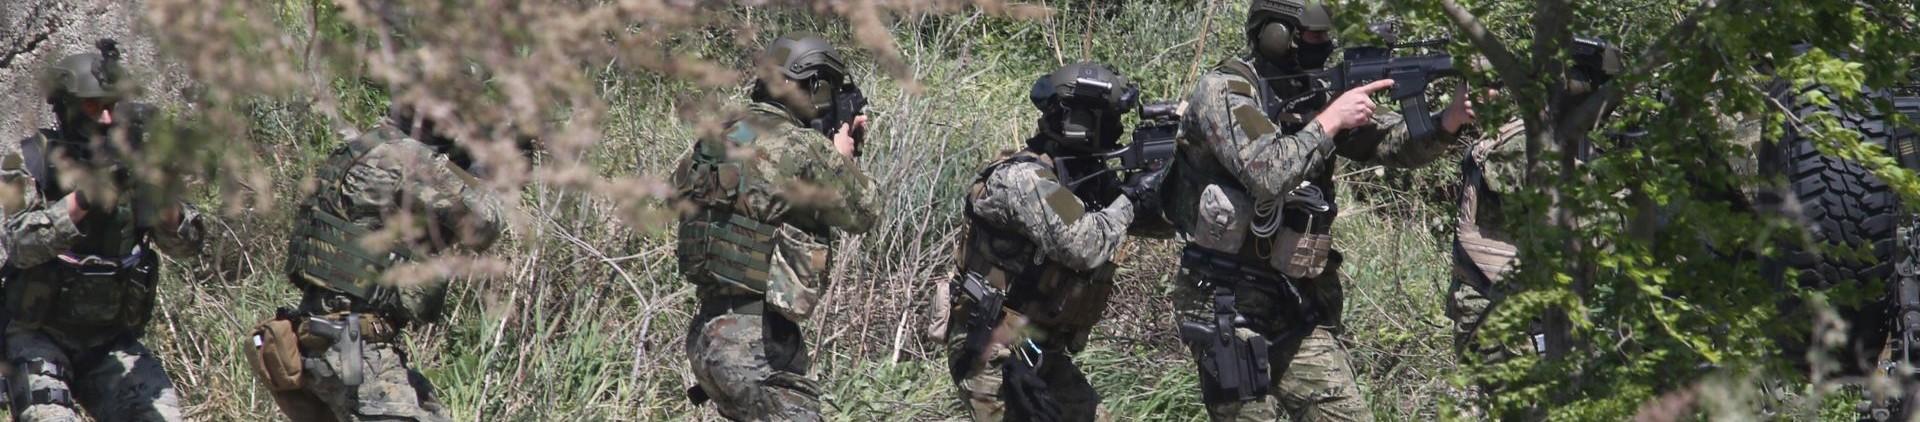 Izraelske snage ubile na Golanu četiri napadača povezana s IS-om